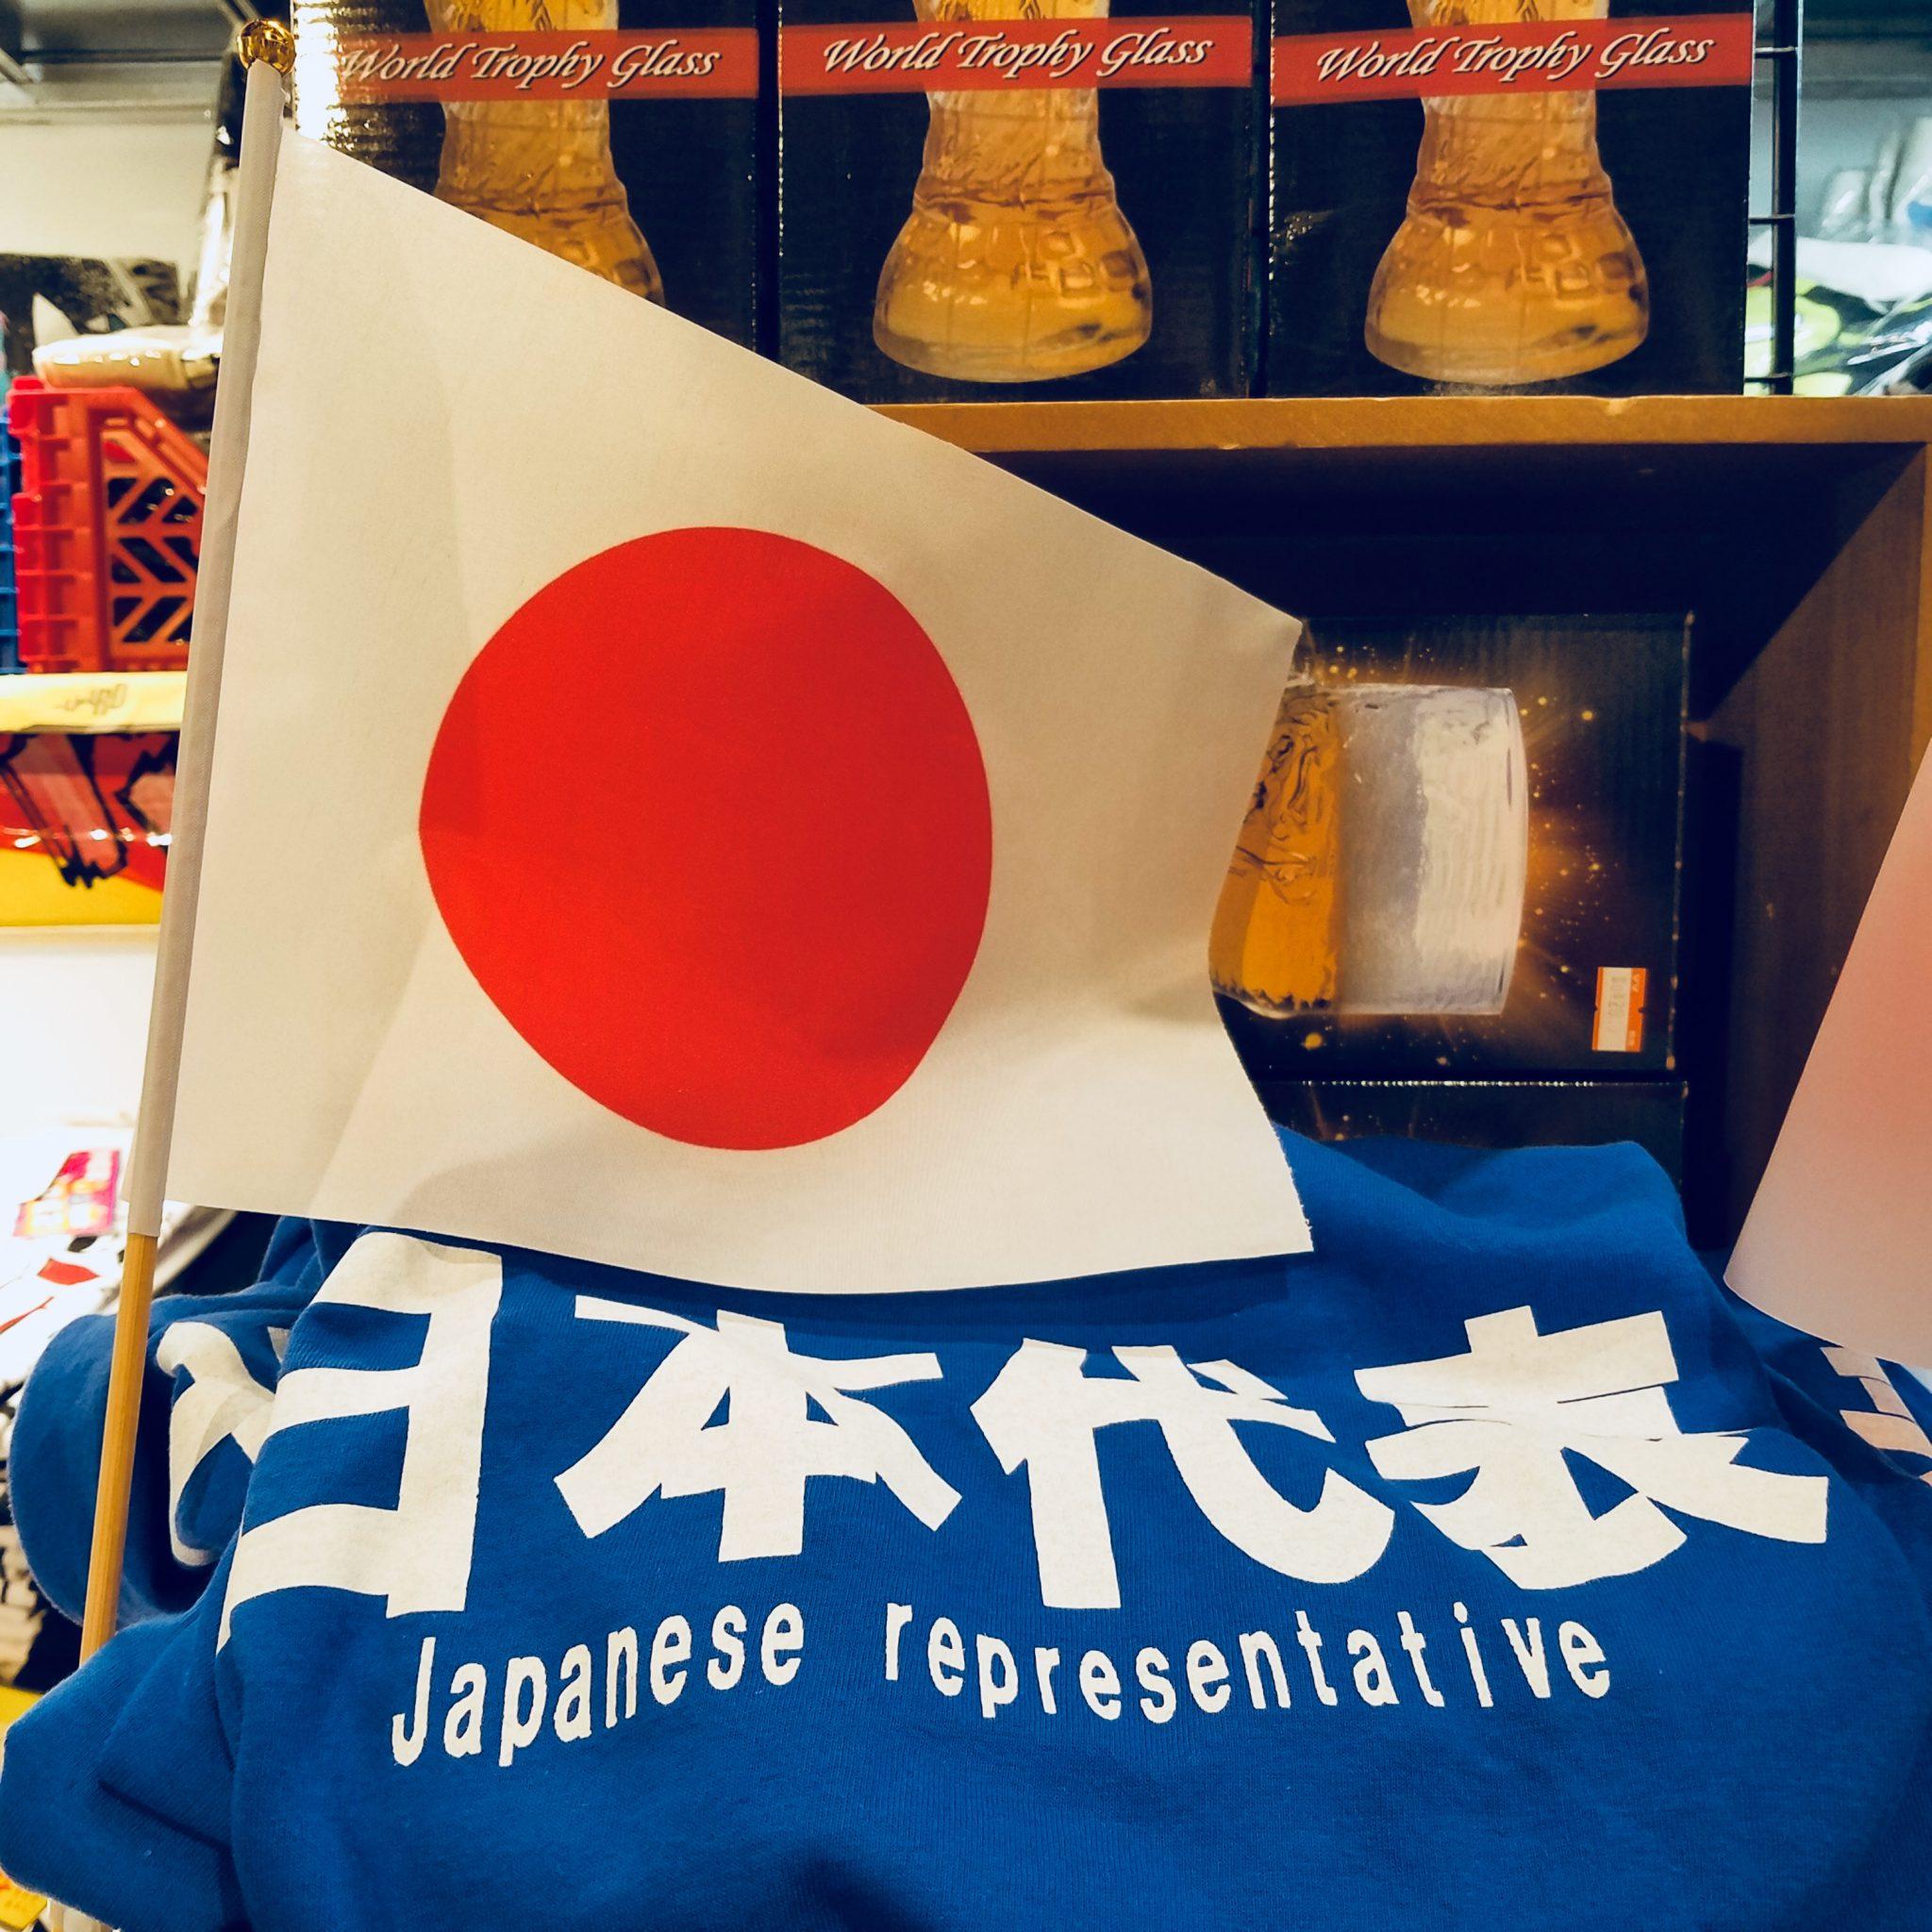 Japan representative T-shirt seen on a Maction Planet Tokyo Private Tour